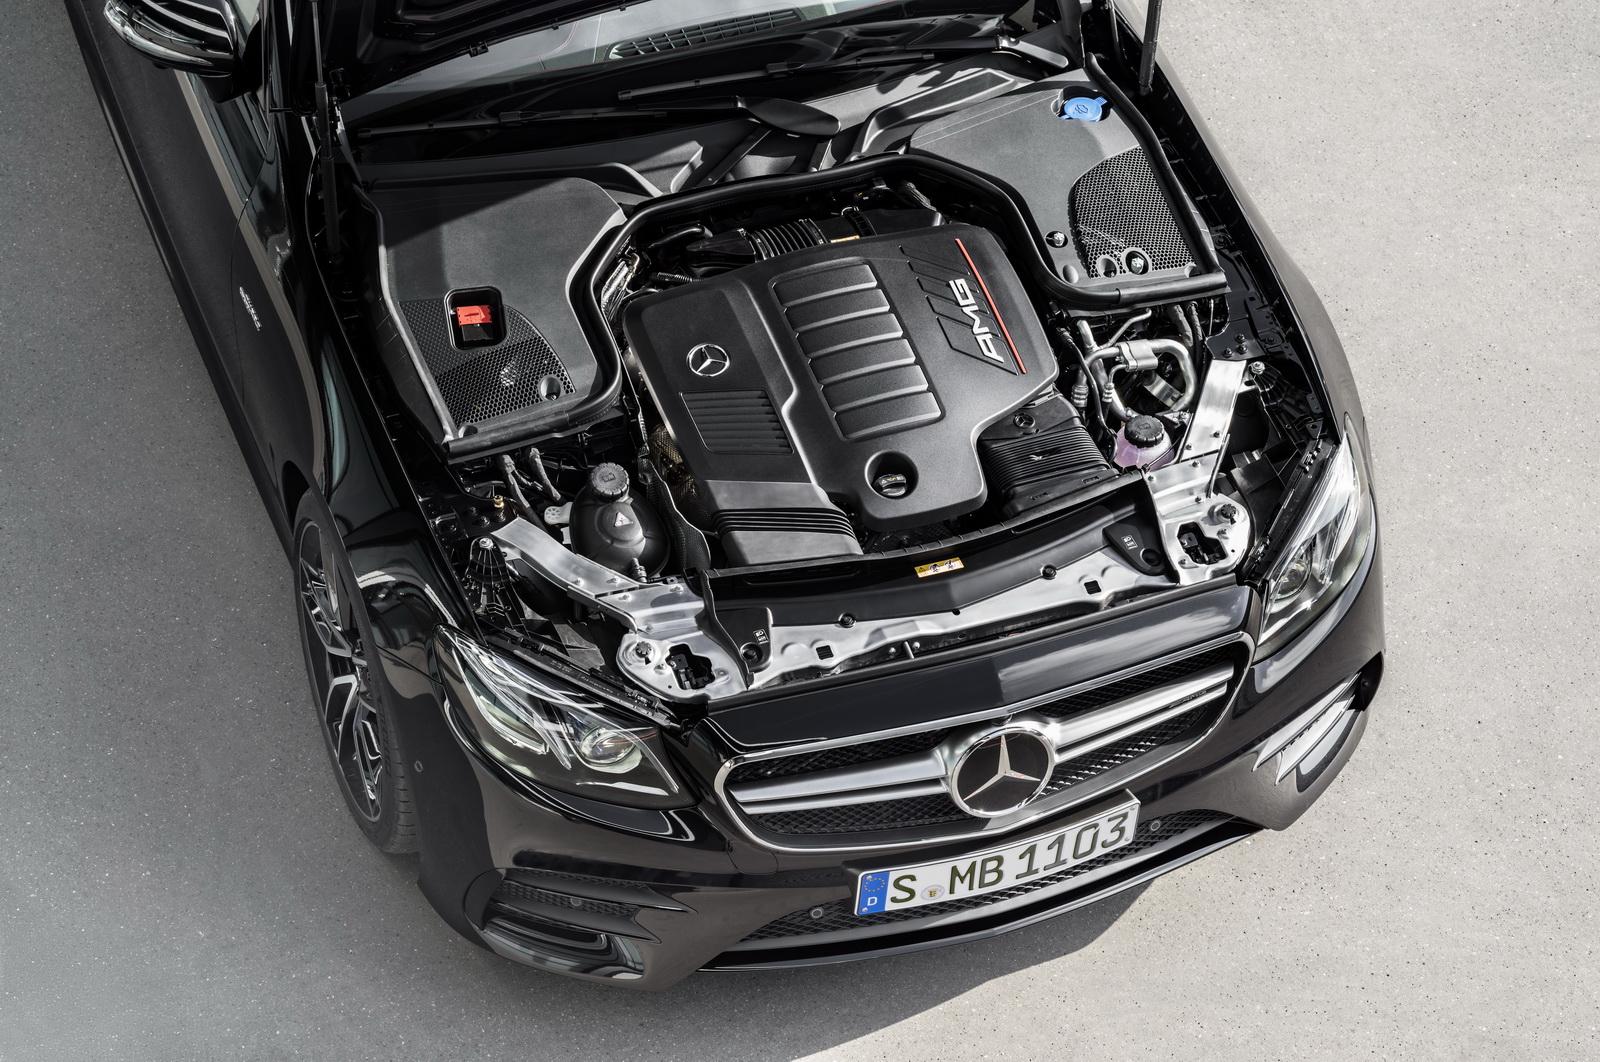 Mercedes-AMG E 53 4MATIC+ CoupéExterieur: Obsidianschwarz metallic, Motorraum // Exterior: Obsidian black metallic, engine(Kraftstoffverbrauch kombiniert: 8,4 l/100 km; CO2-Emissionen kombiniert: 200 g/km)(fuel consumption combined: 8.4 l/100 km; CO2 emissions combined: 200 g/km)